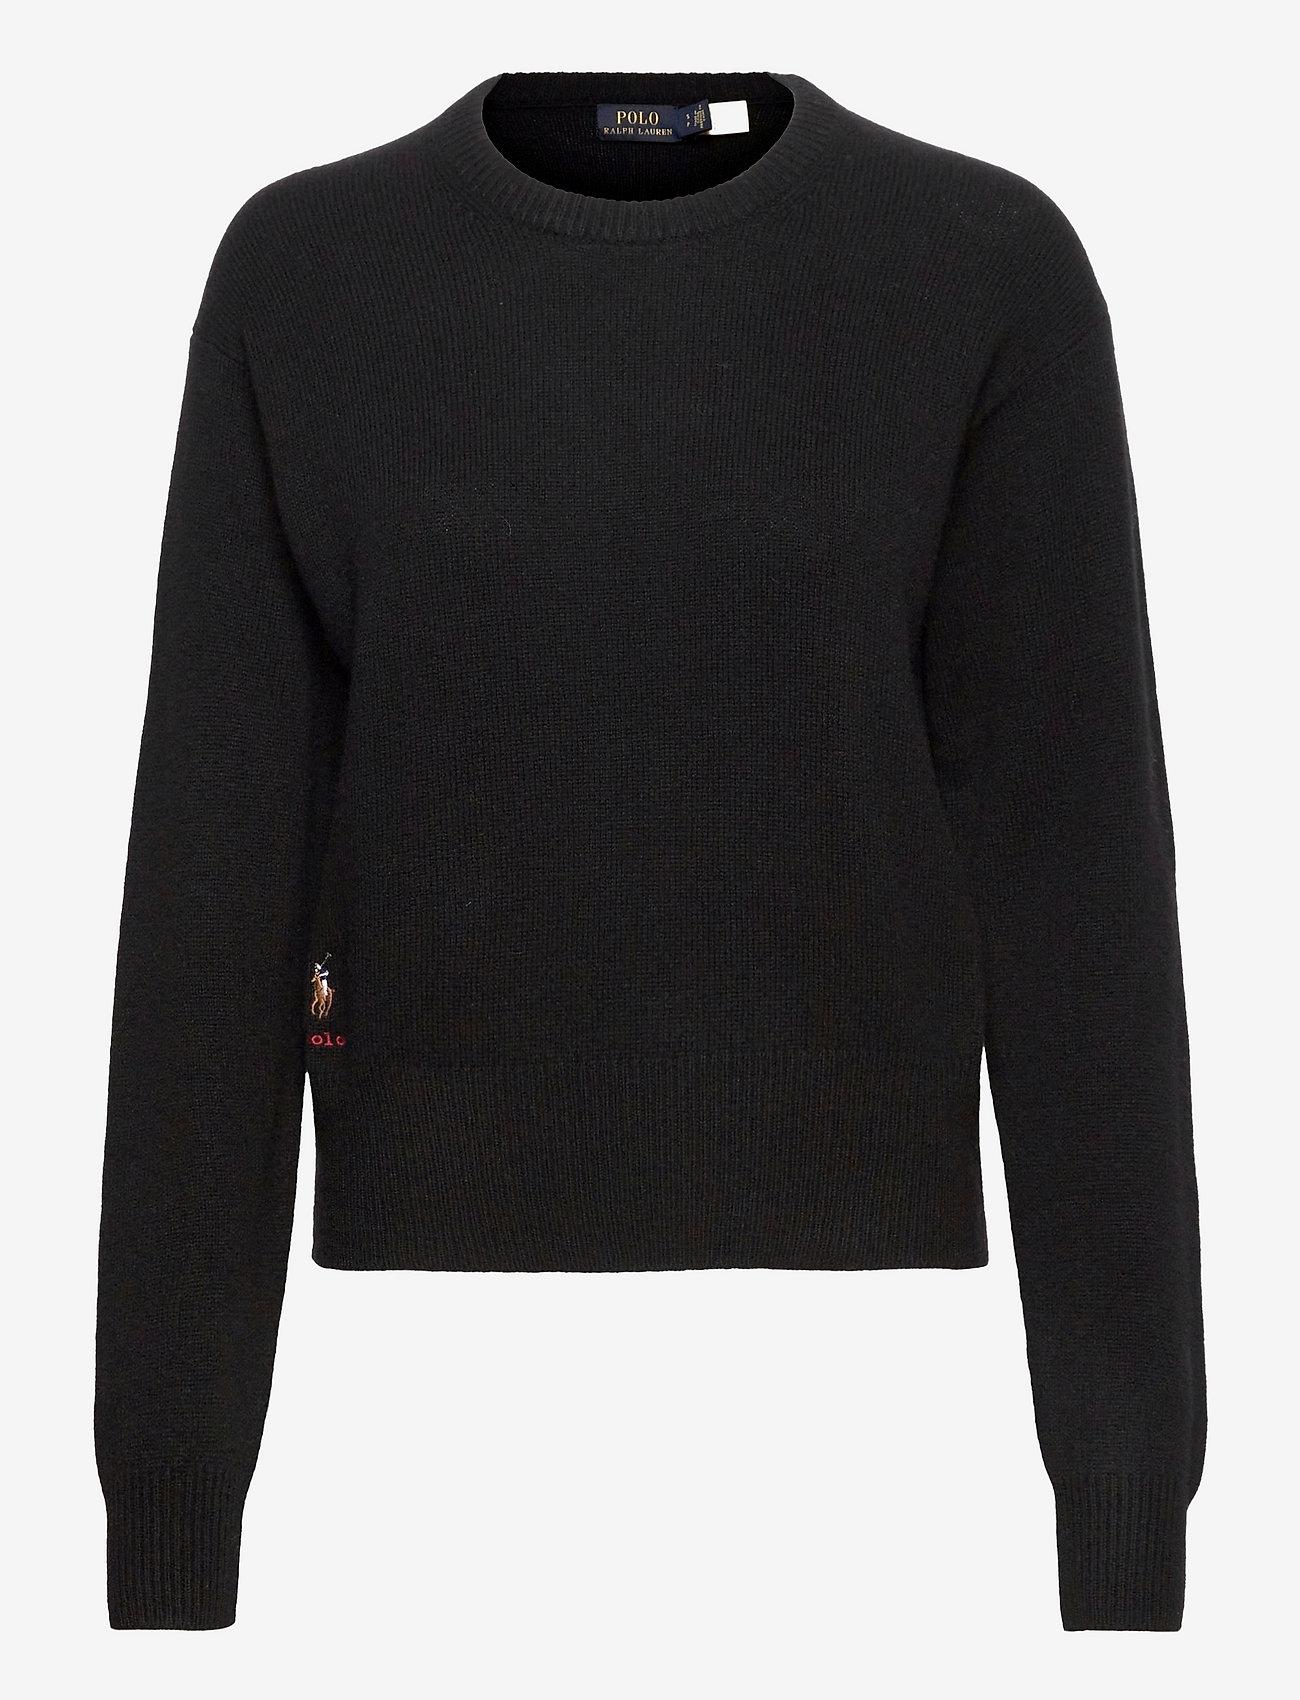 Polo Ralph Lauren - Wool-Blend Crewneck Sweater - jumpers - polo black - 0